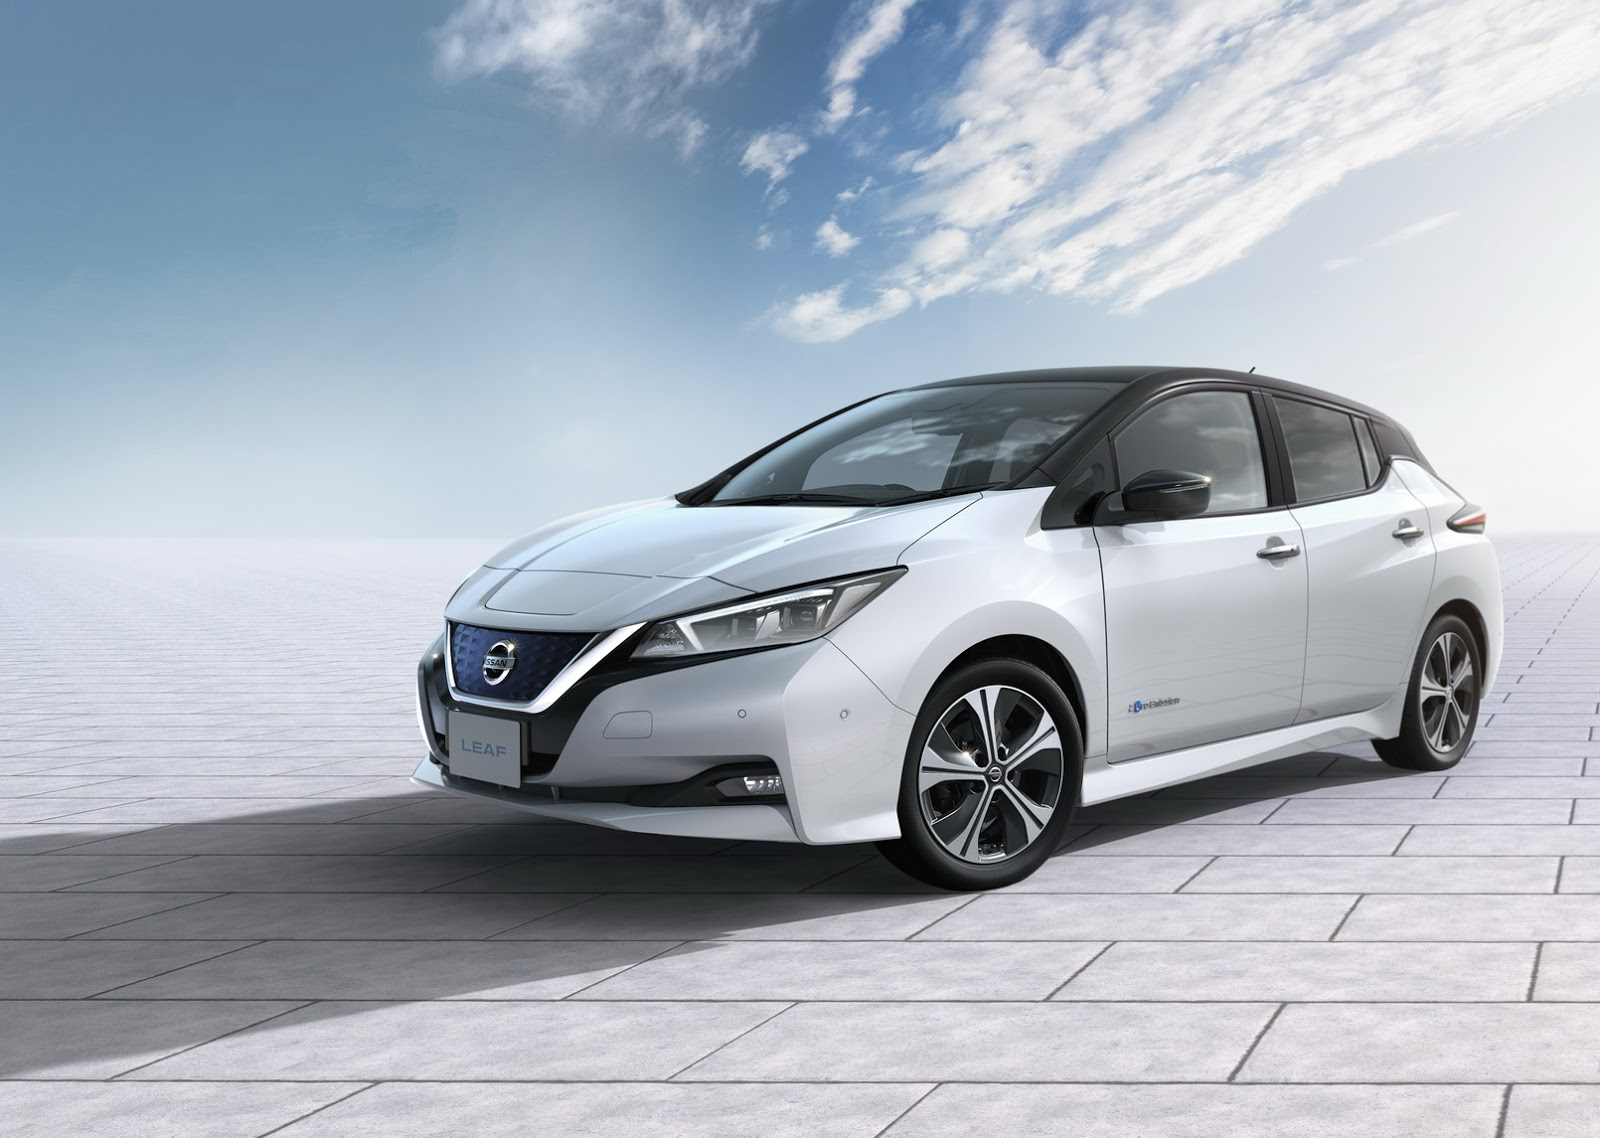 Nissan Leaf 2018 EU (21)